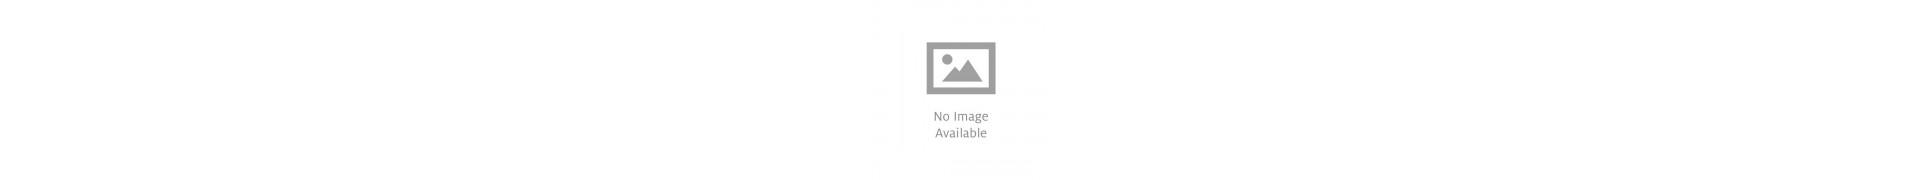 PINCE JON8 02835 METAL CHROME-75mm25mm